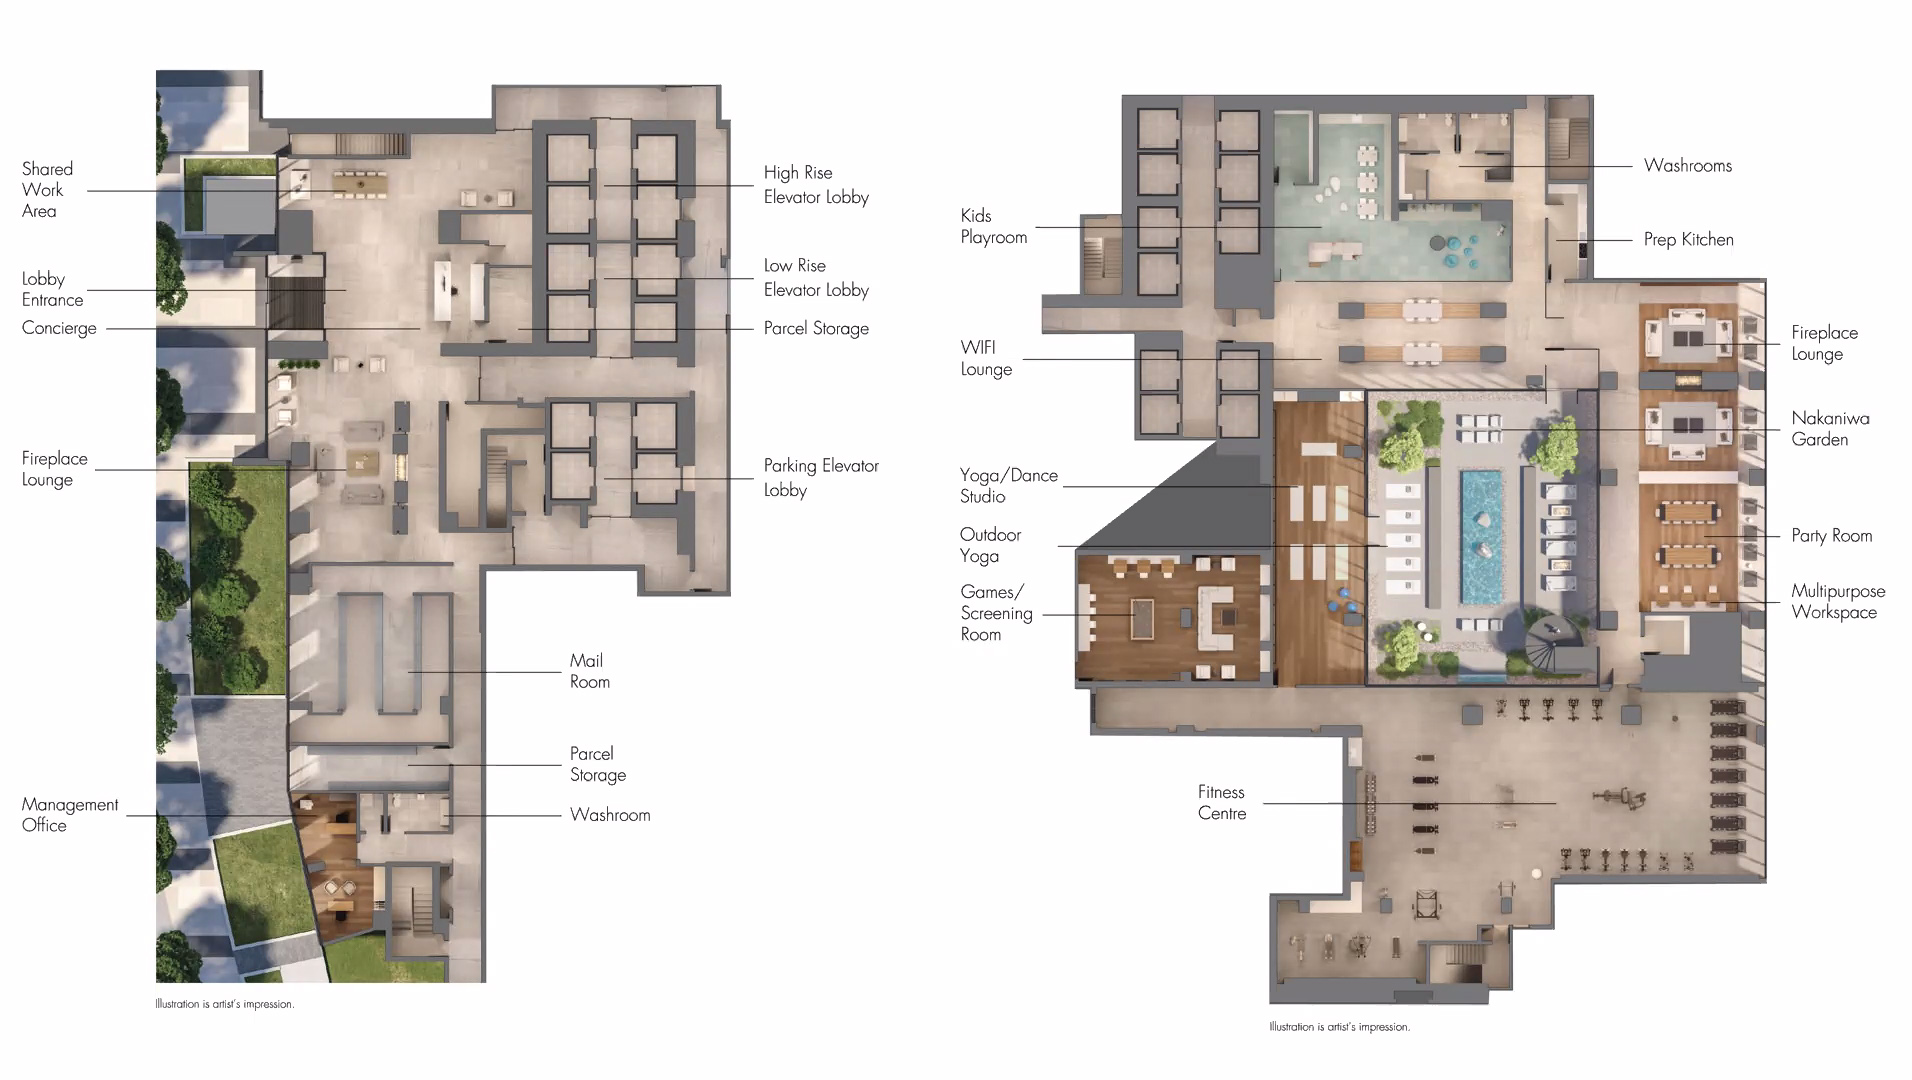 m4-condos-for-sale-mississauga-square-one-indoor-amenities